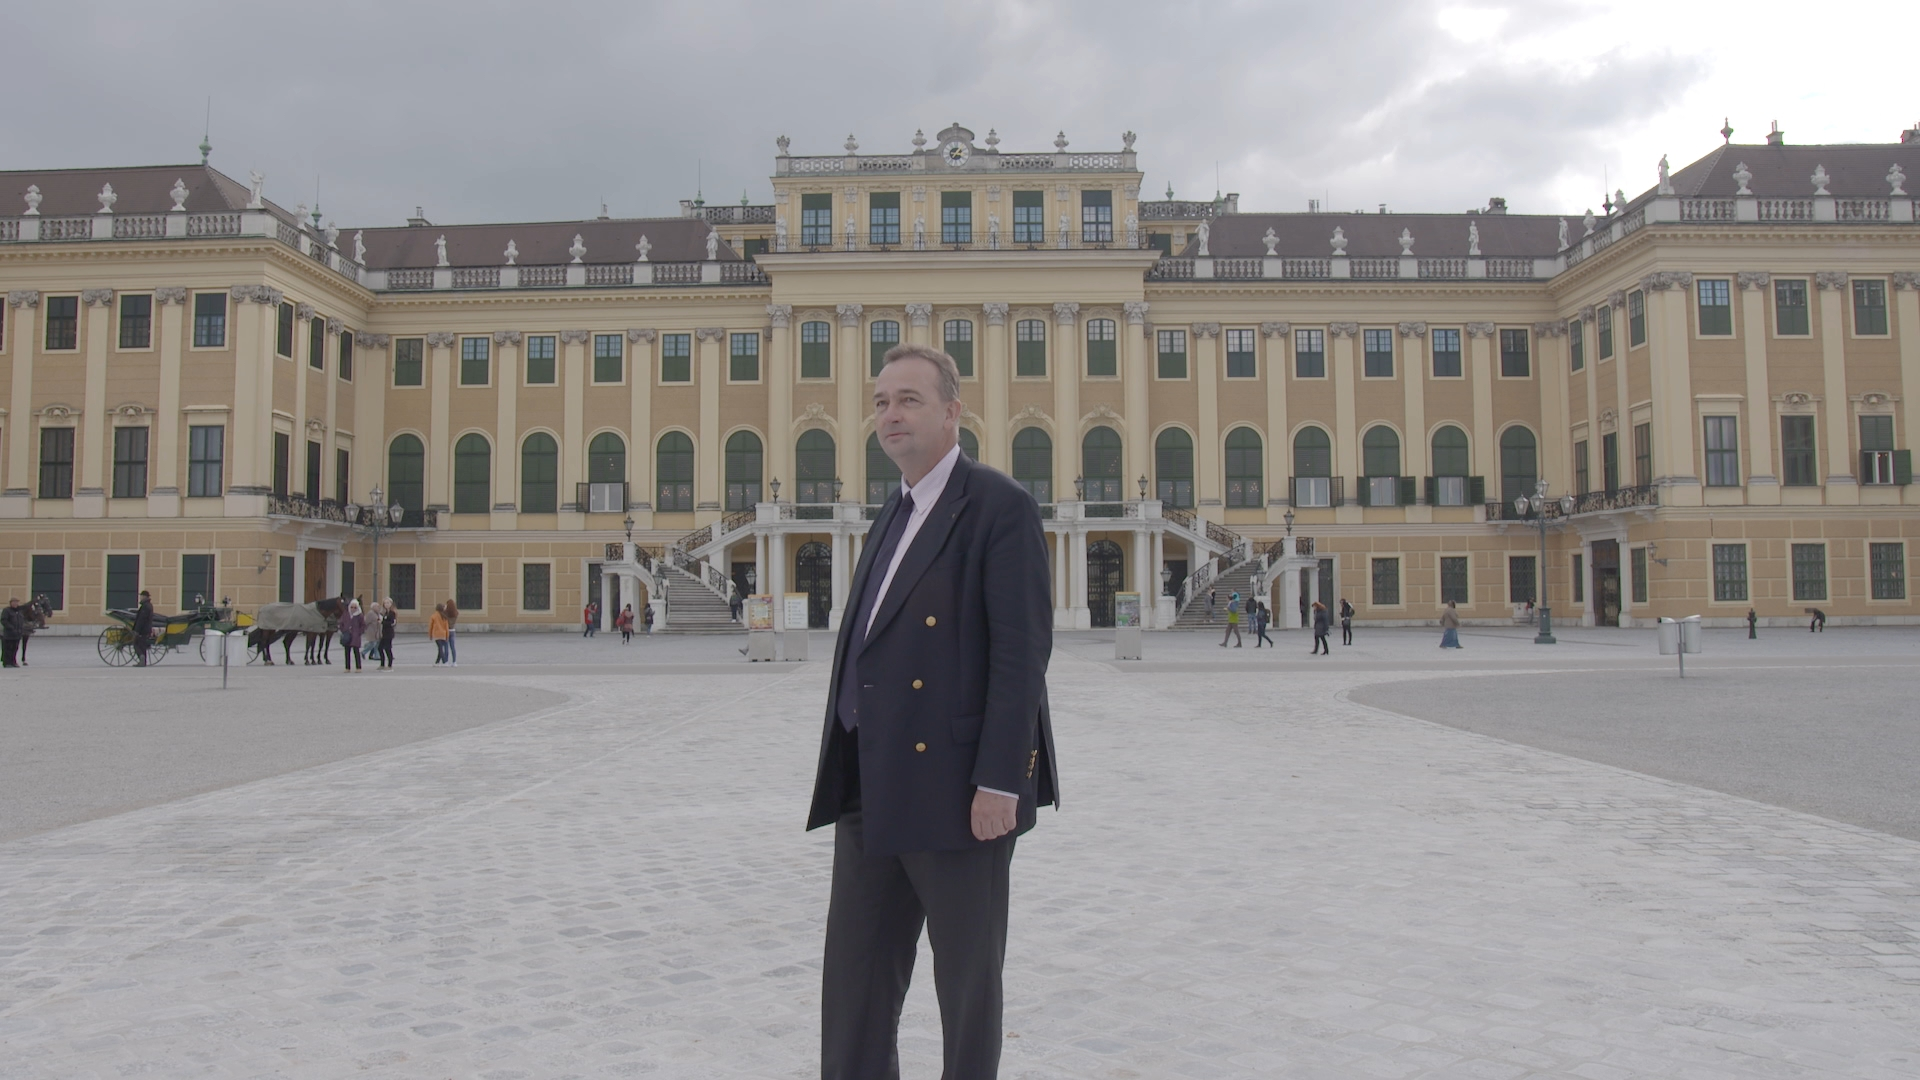 Herr_Habsburg